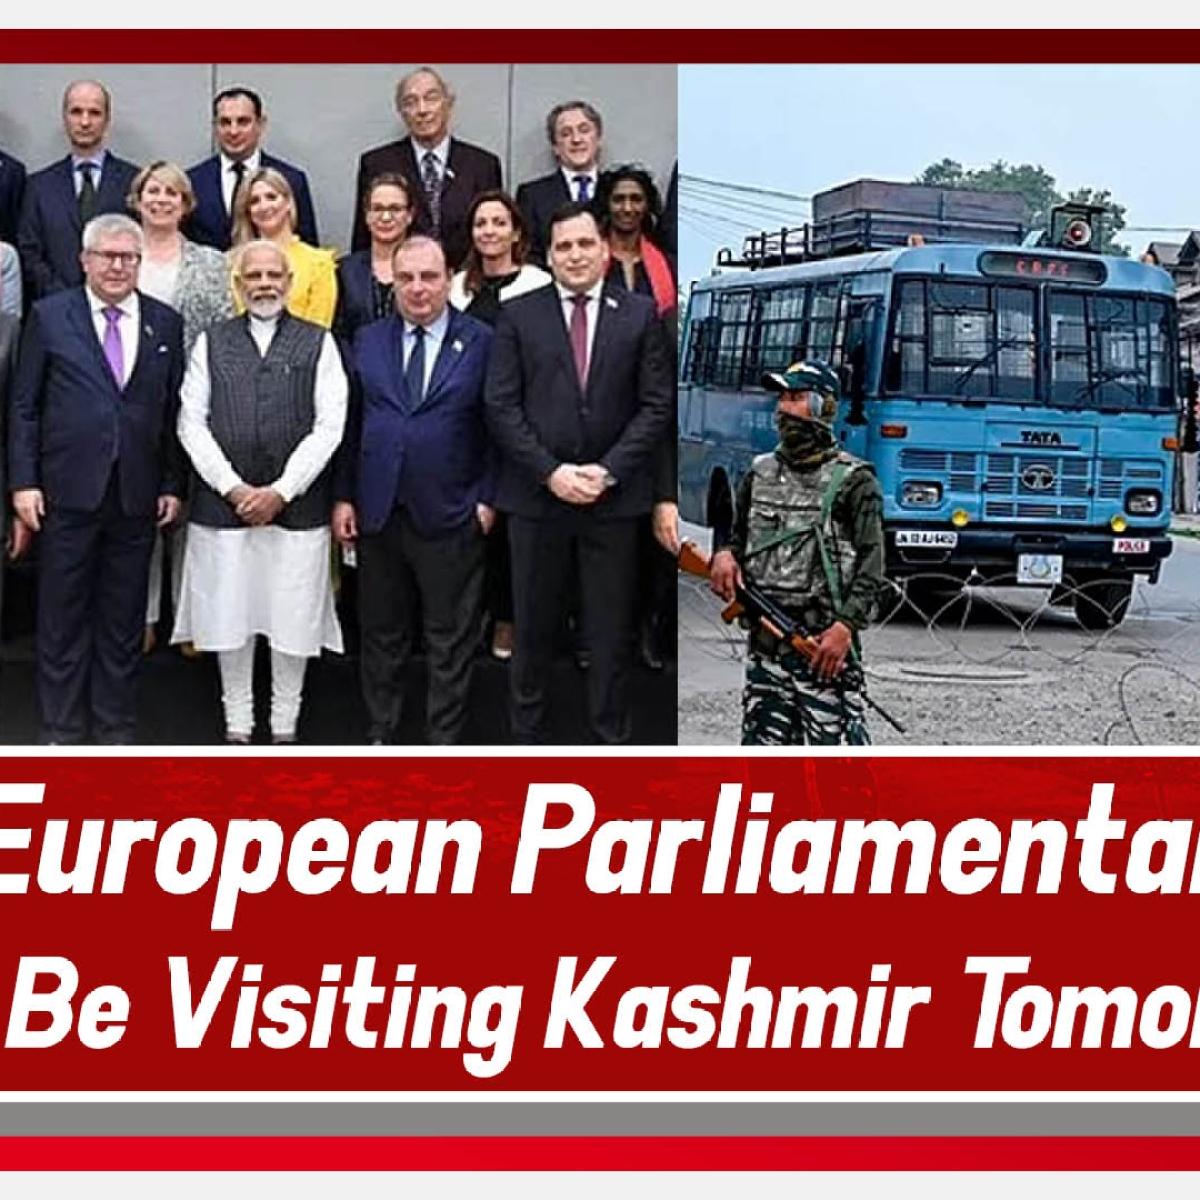 28-member delegation from European Parliament to visit Kashmir, meet PM Modi